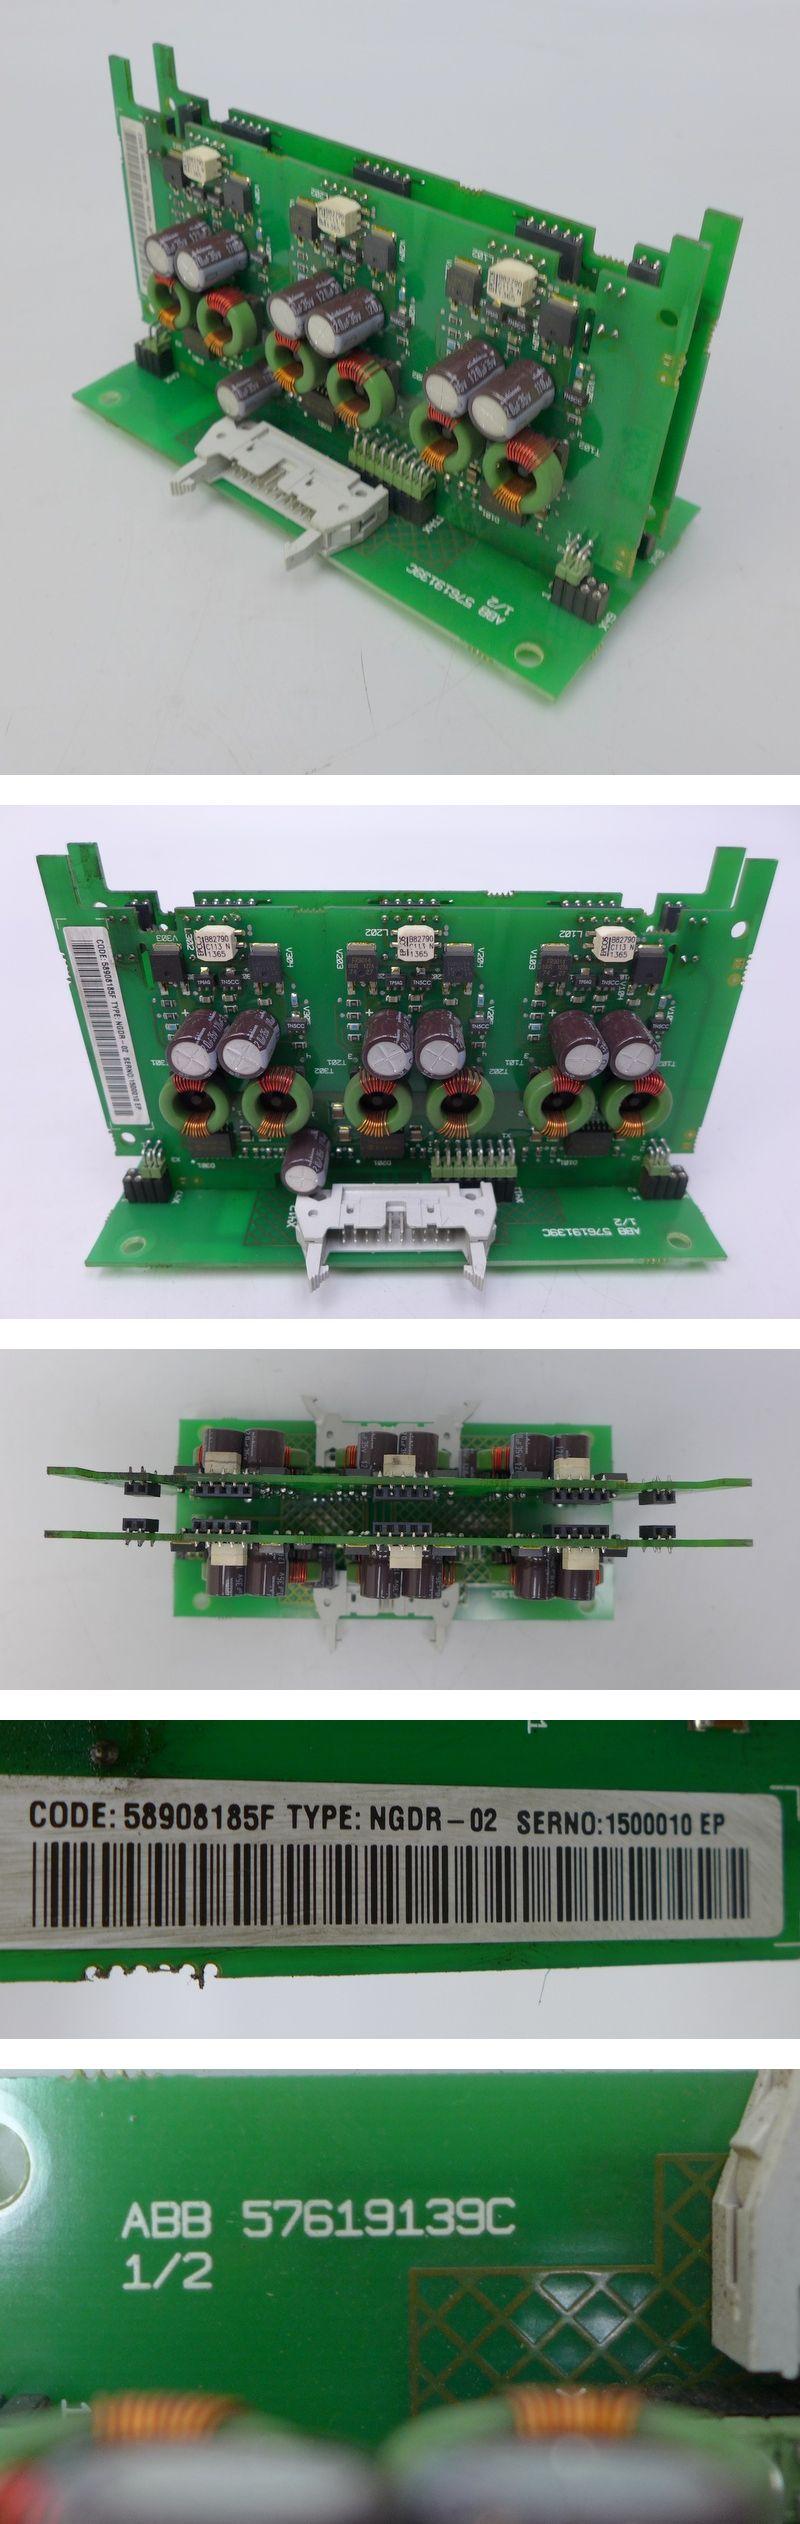 ABB 57619139C 2x NGDR-02